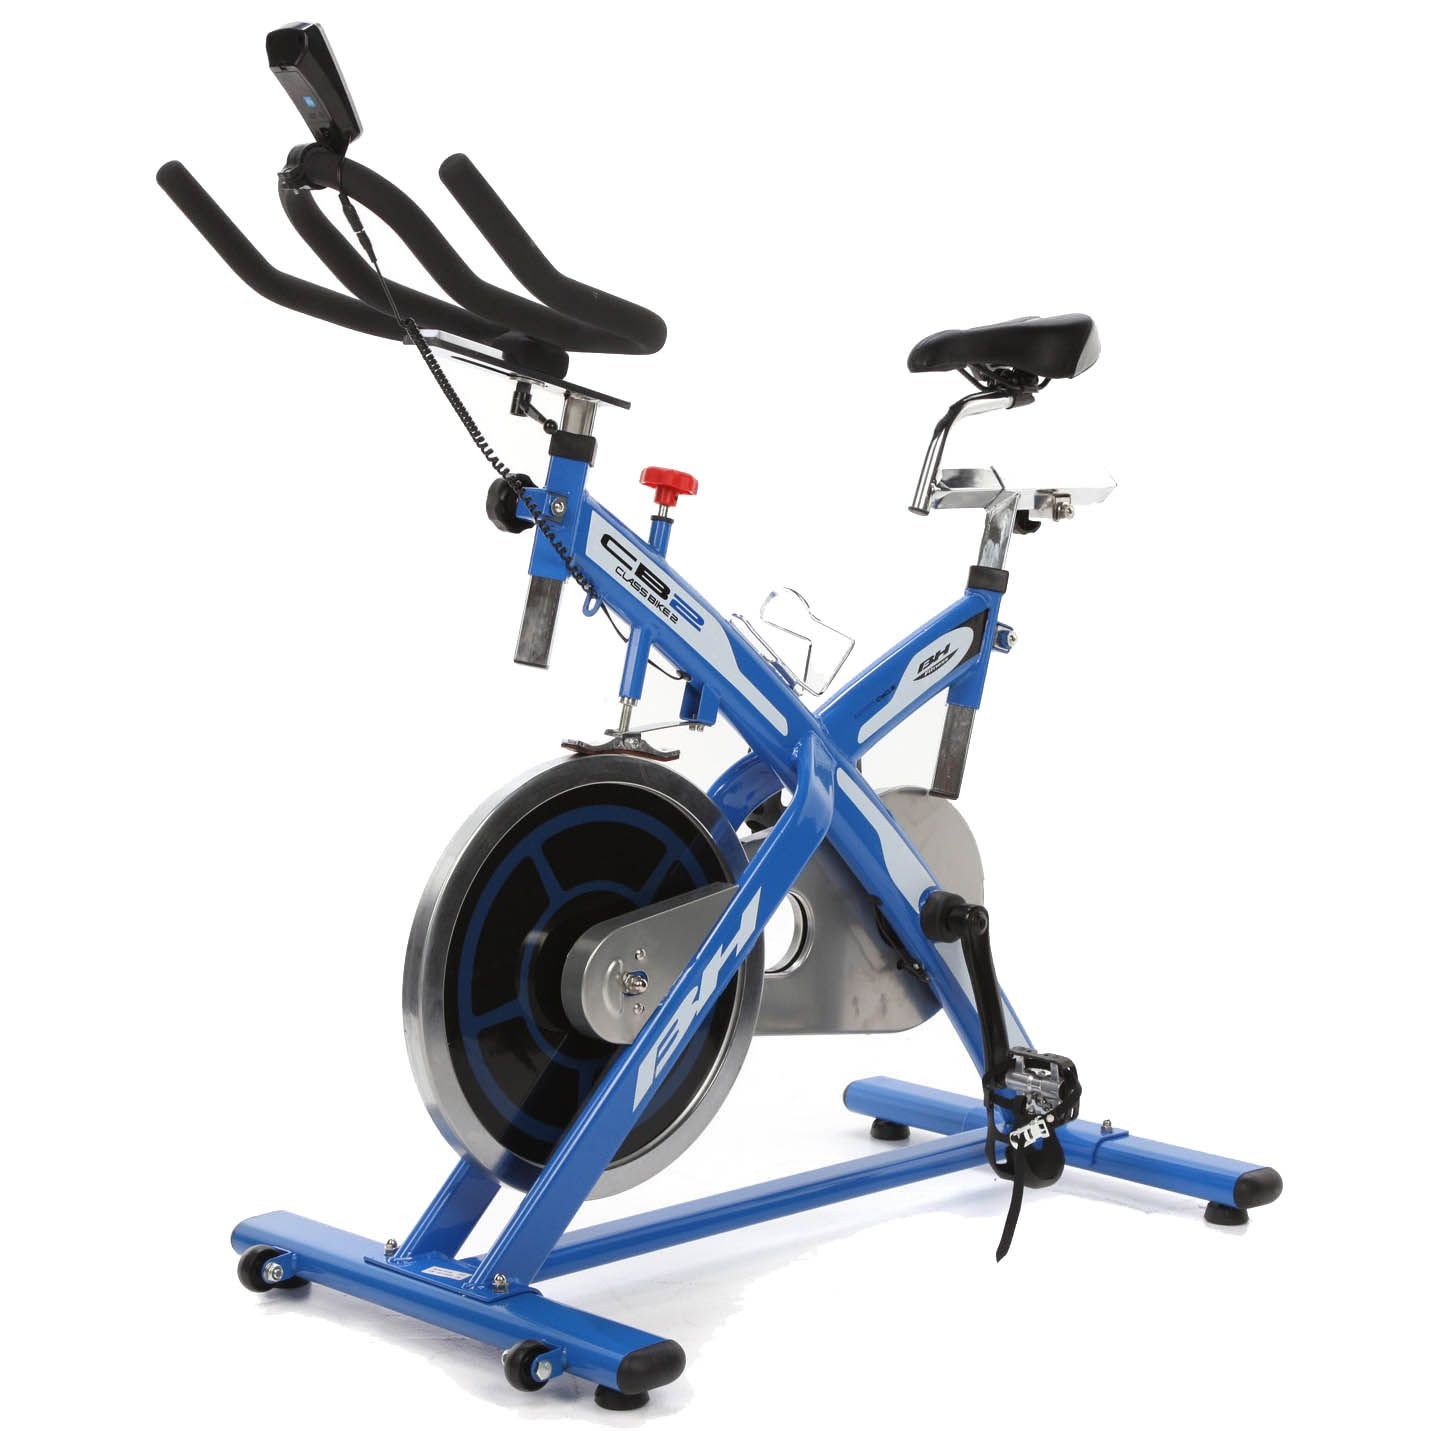 Bh Fitness Class Bike 2 Indoor Cycle Sweatband Com